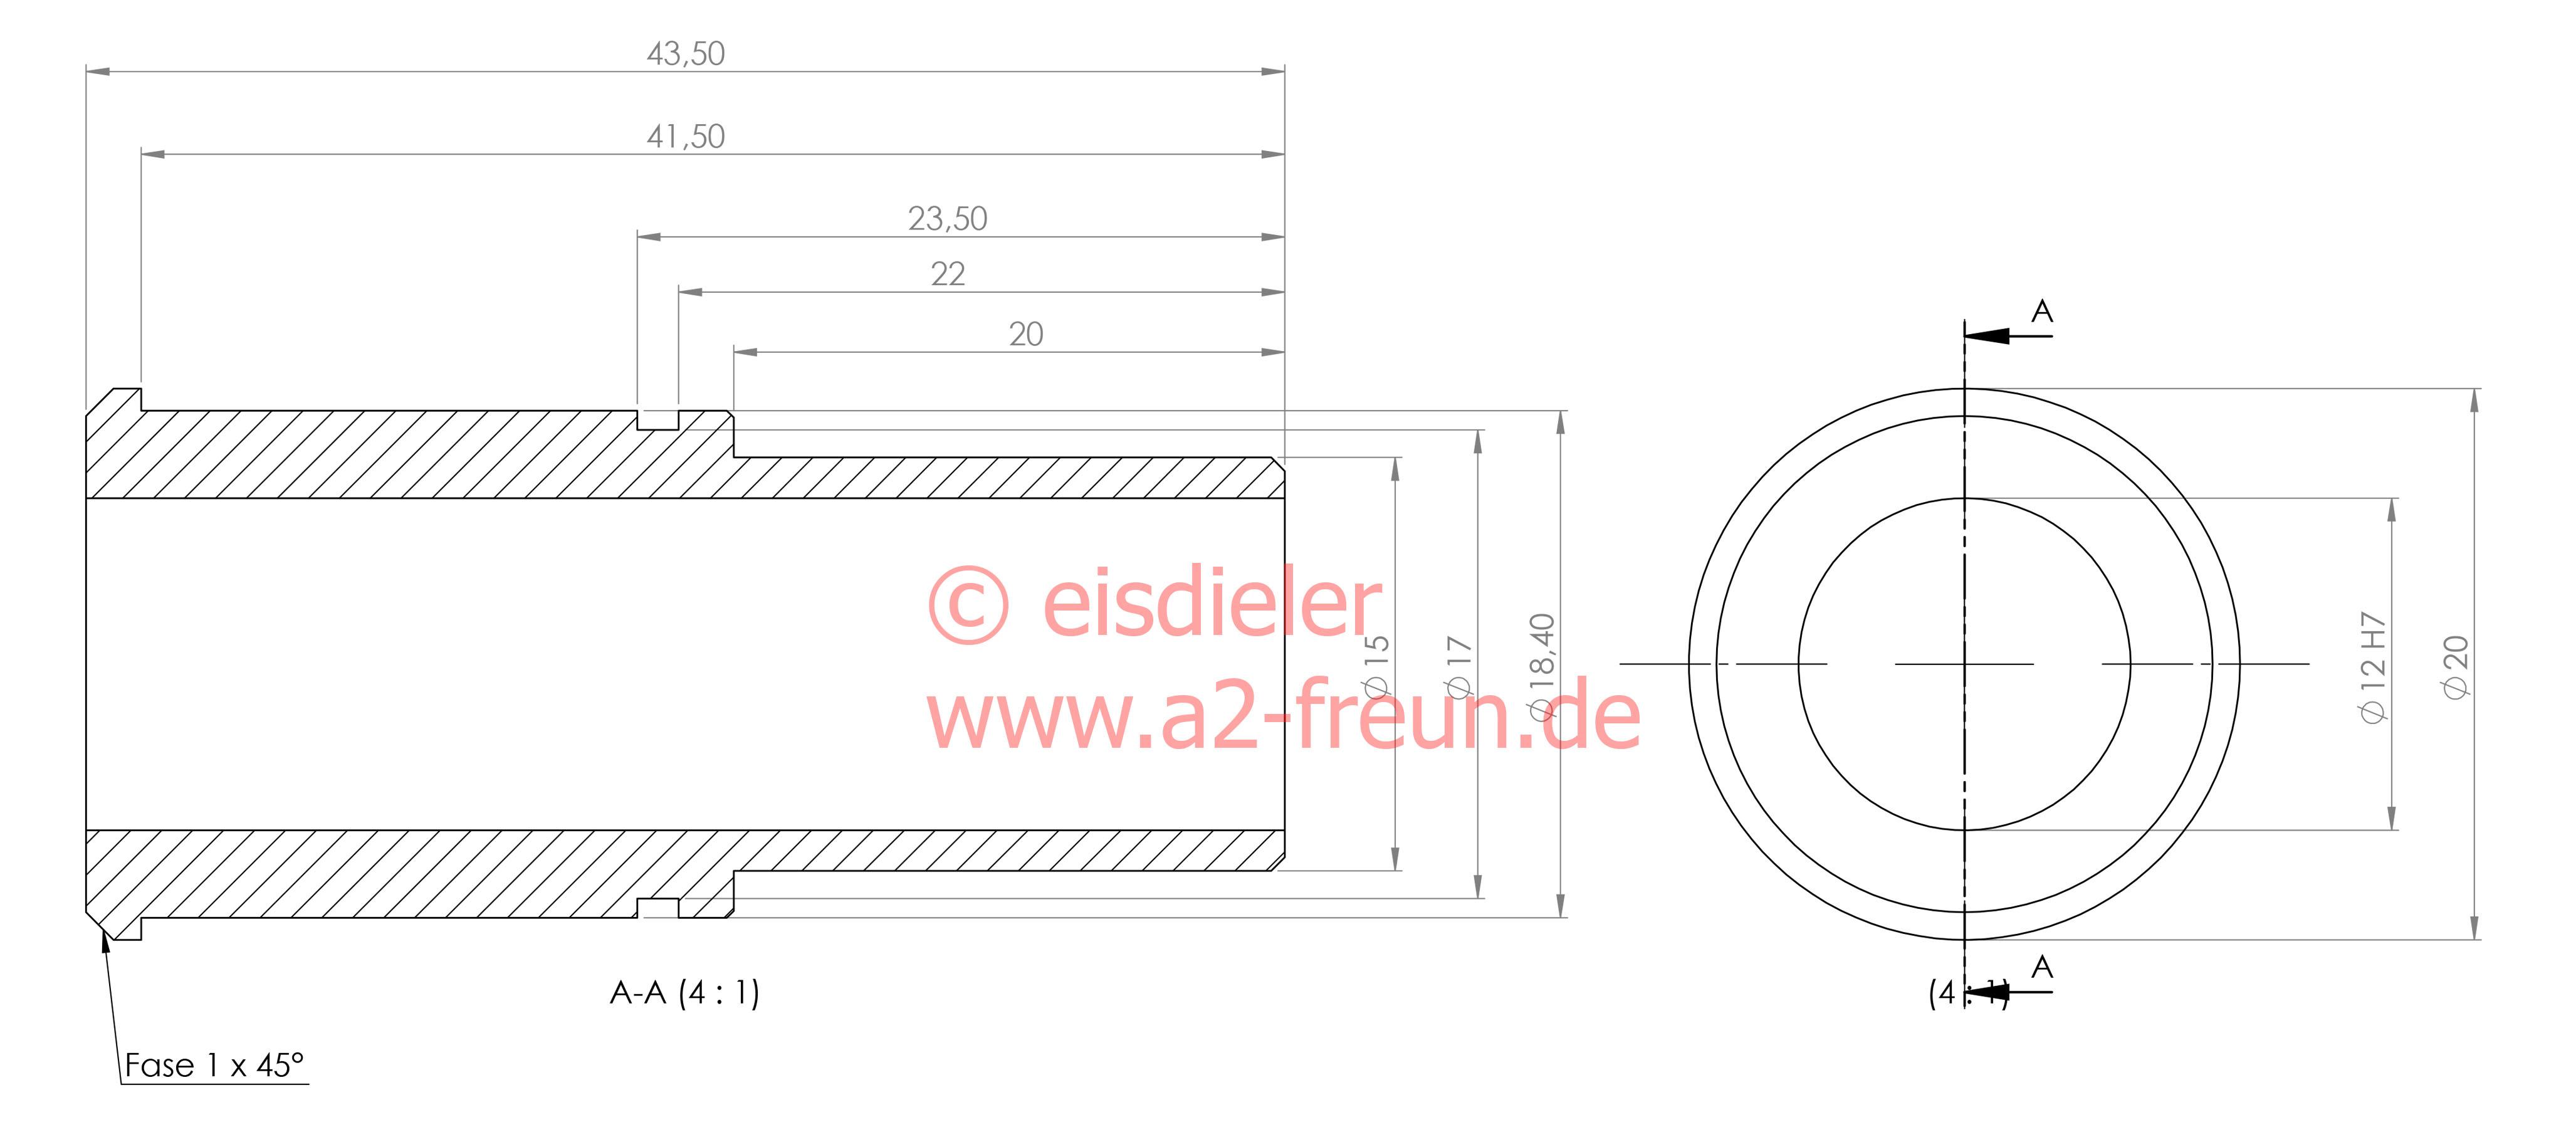 CAD_Zeichnung.JPG.ca1ec8c04d086ec48c94a53a128f8bac.JPG